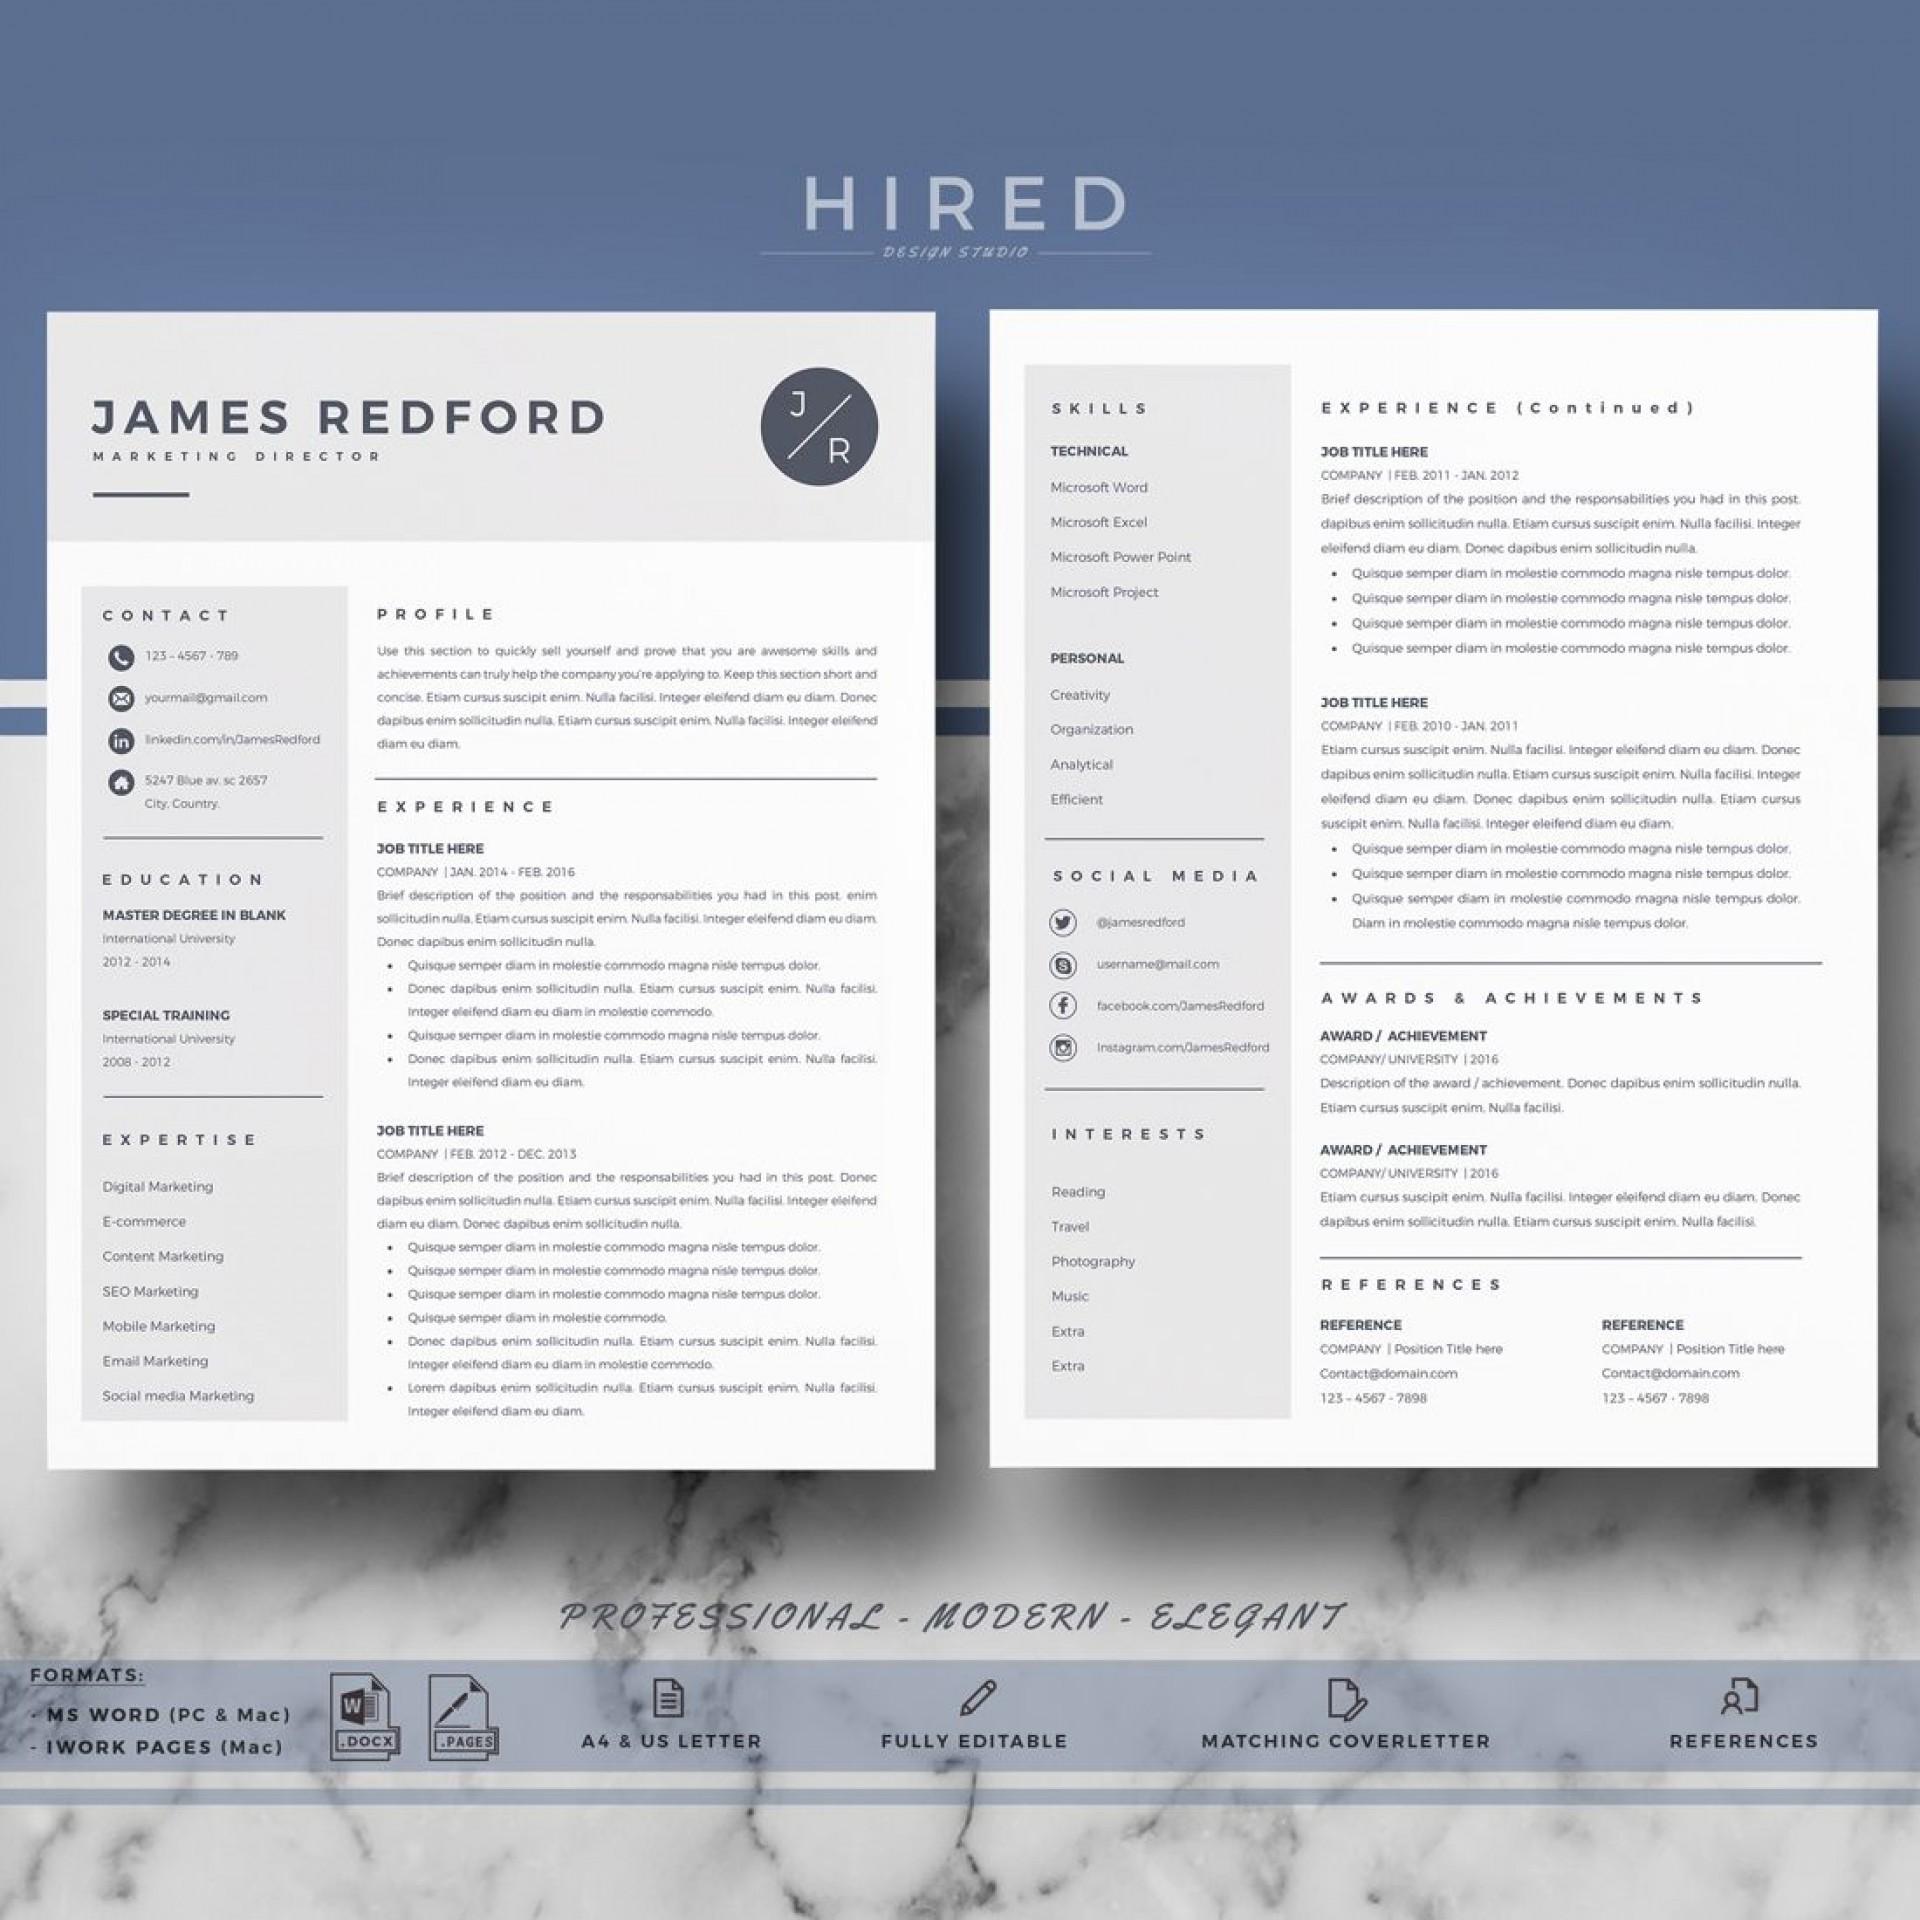 001 Phenomenal Word Resume Template Mac Design  2008 Microsoft 20111920